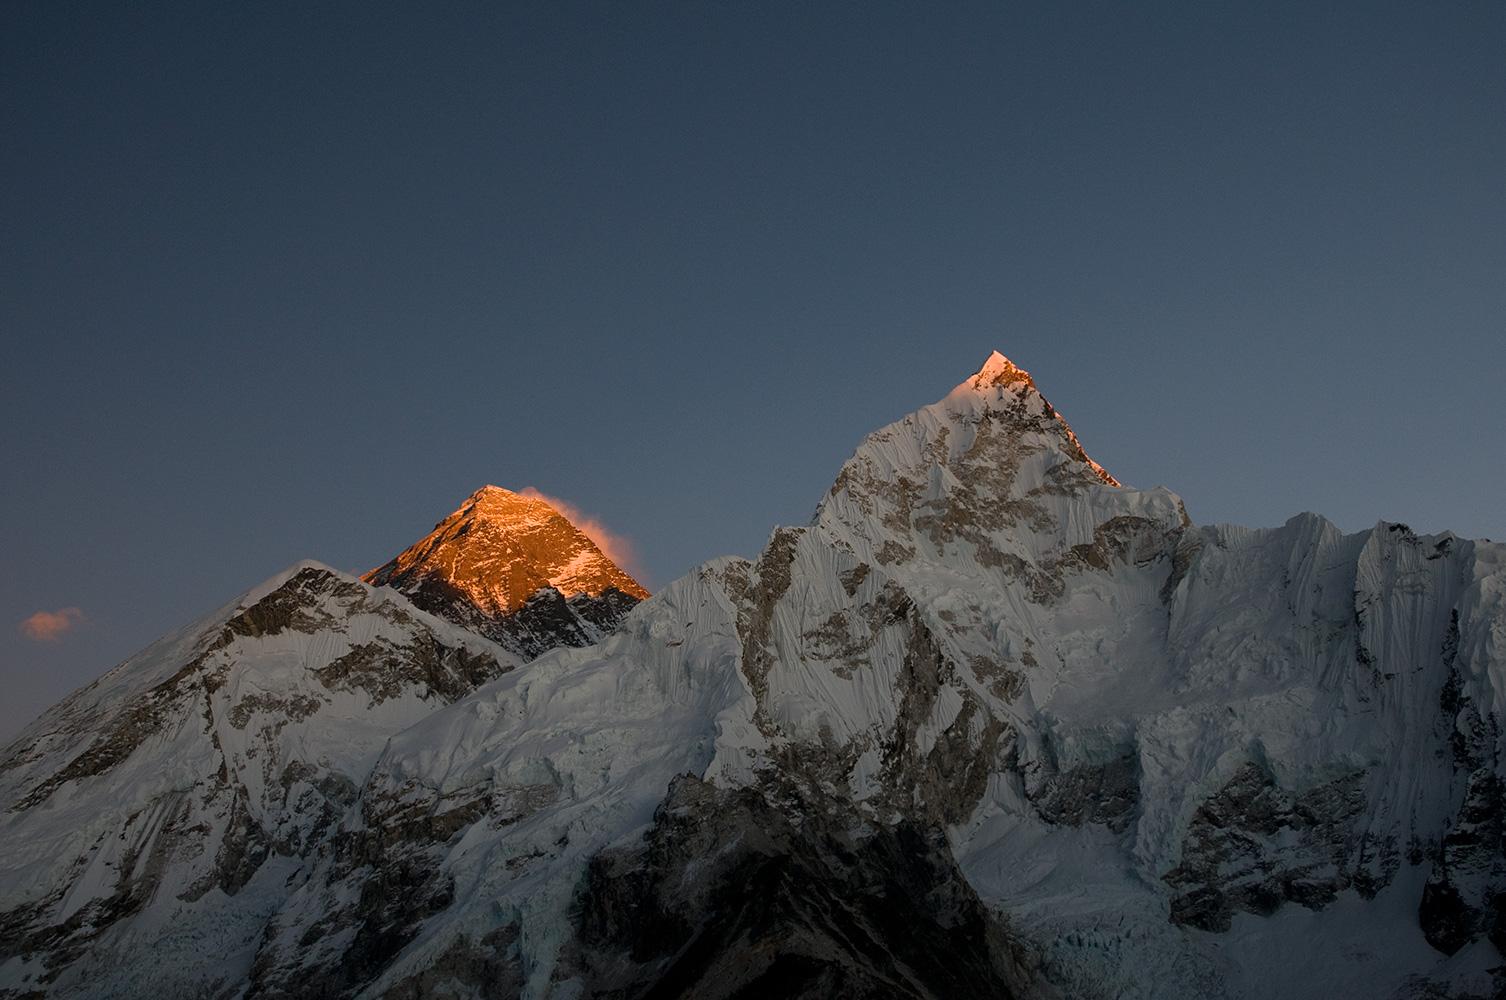 At sunset from Kala PattarNikon D300, 50mm